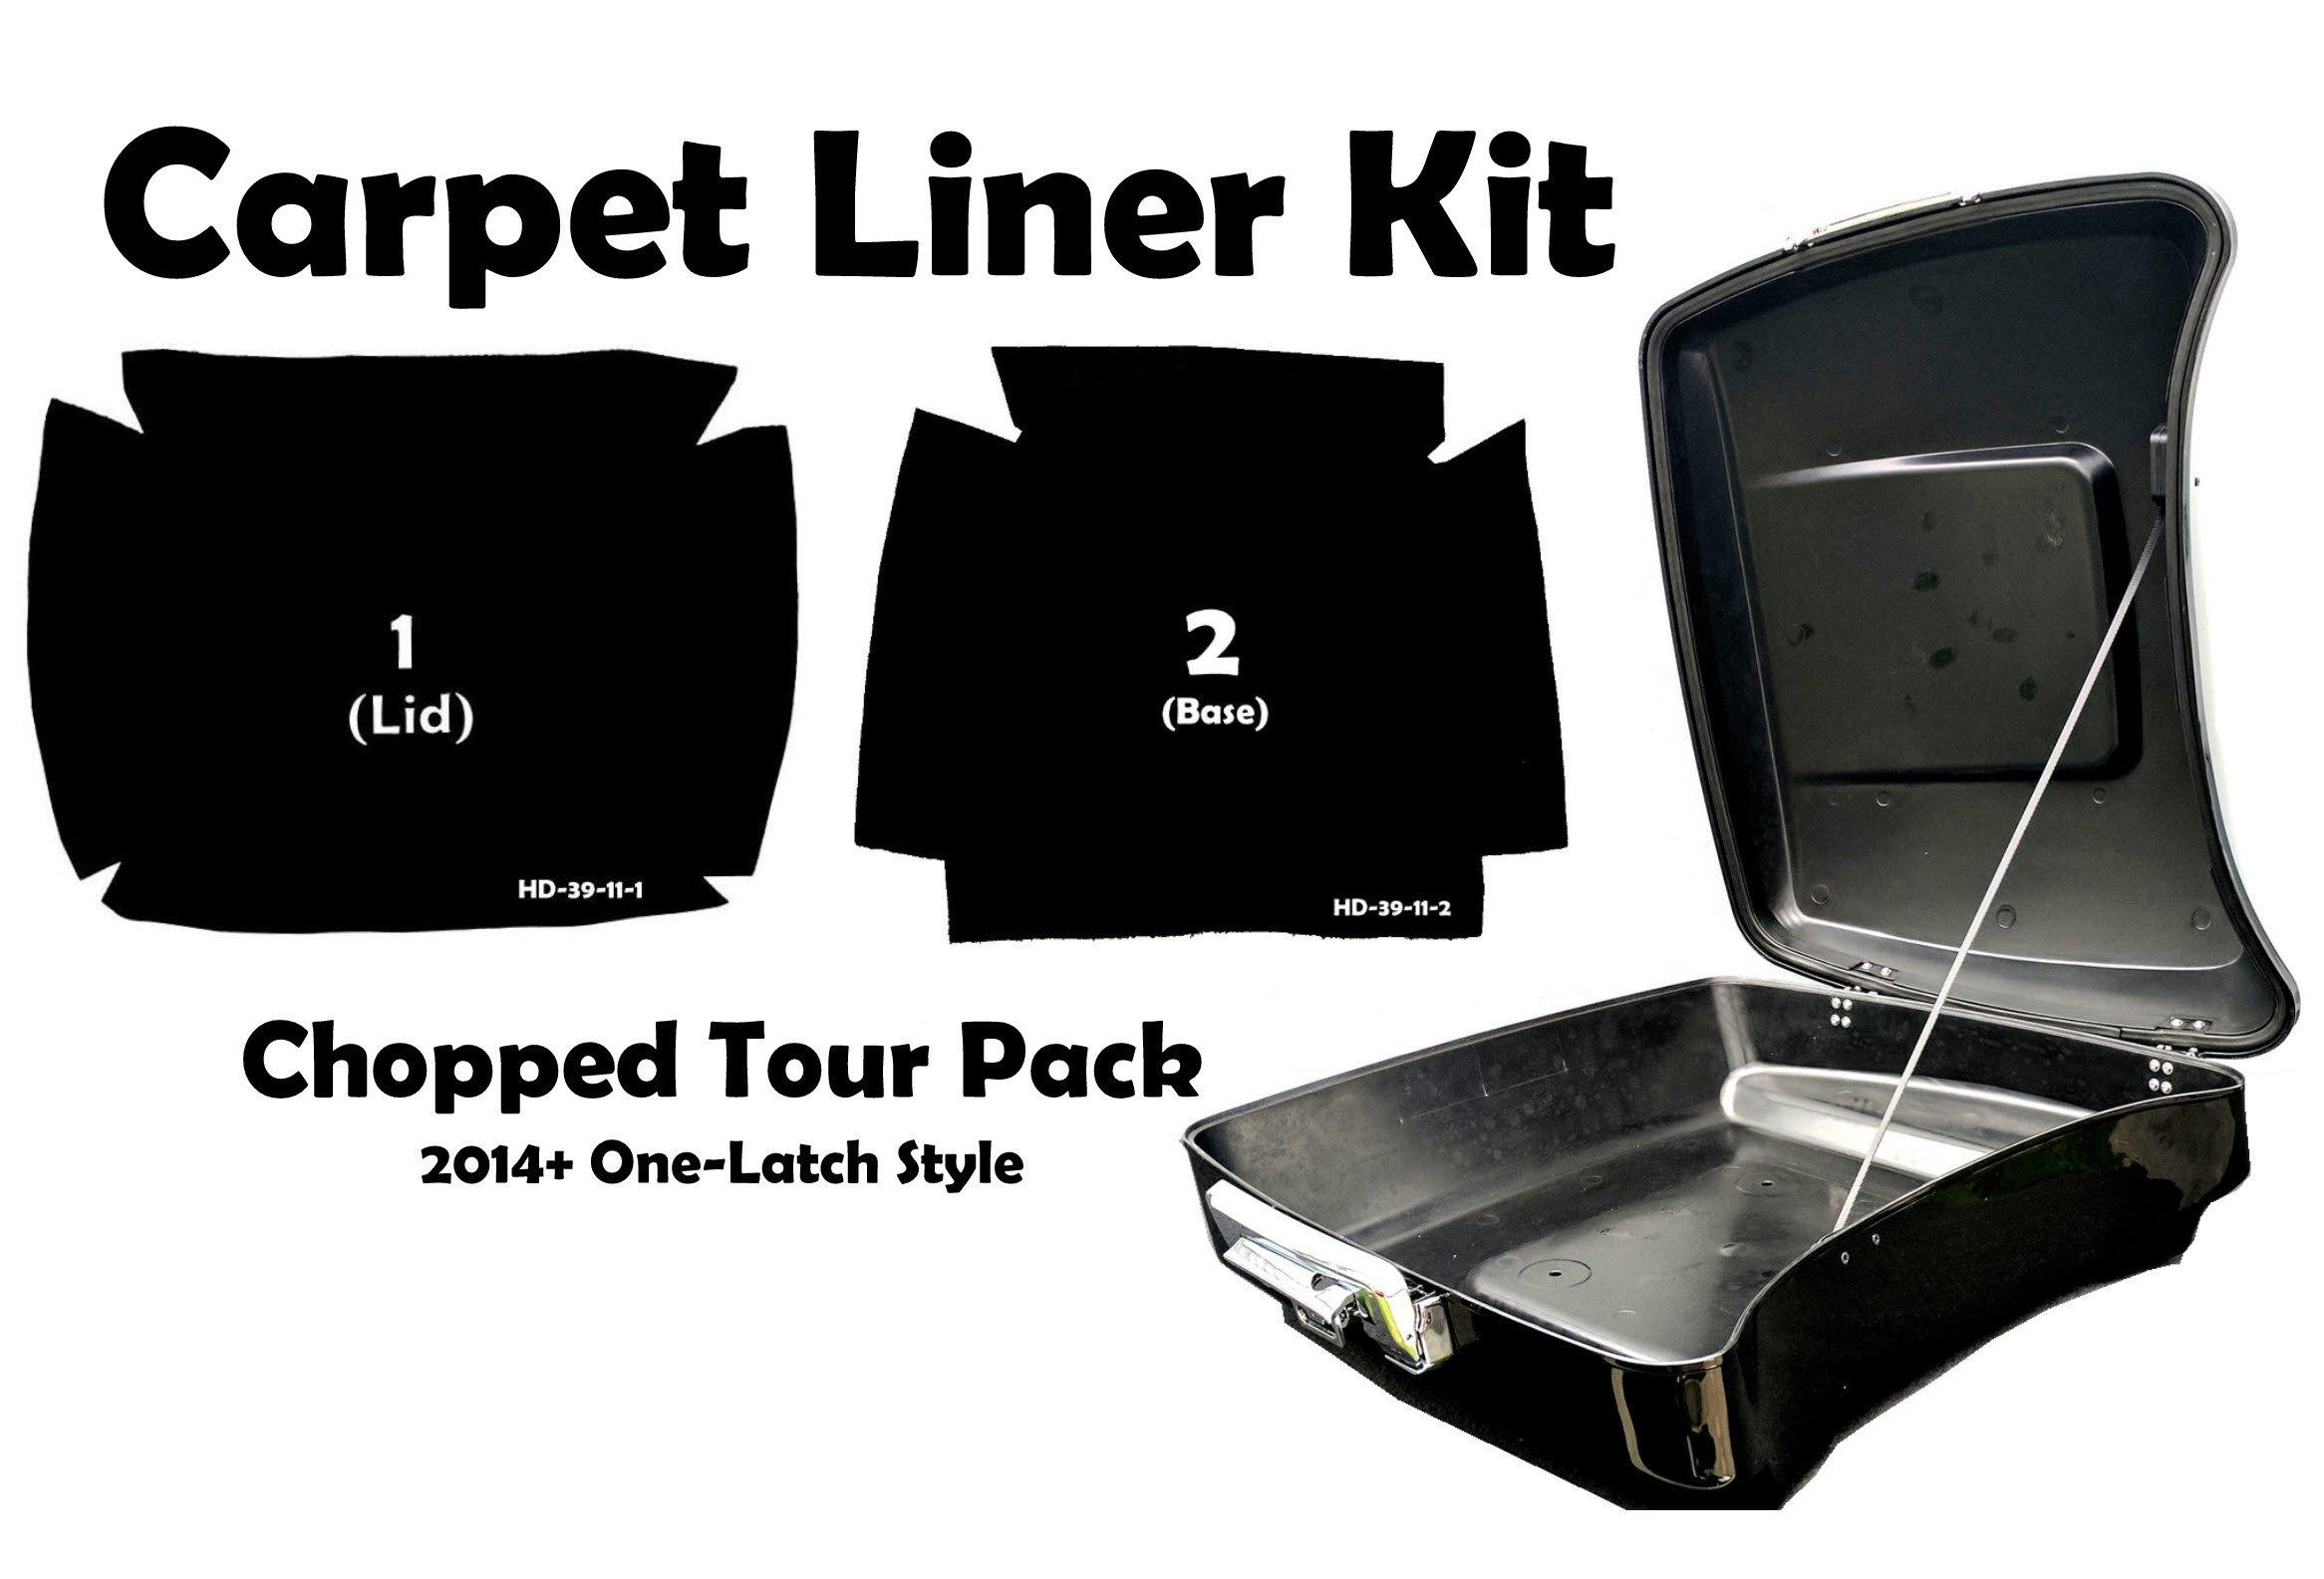 Carpet Liner Kit for 2014-2018 One Latch Style Harley-Davidson Chopped Tour Pak Pack (Black)